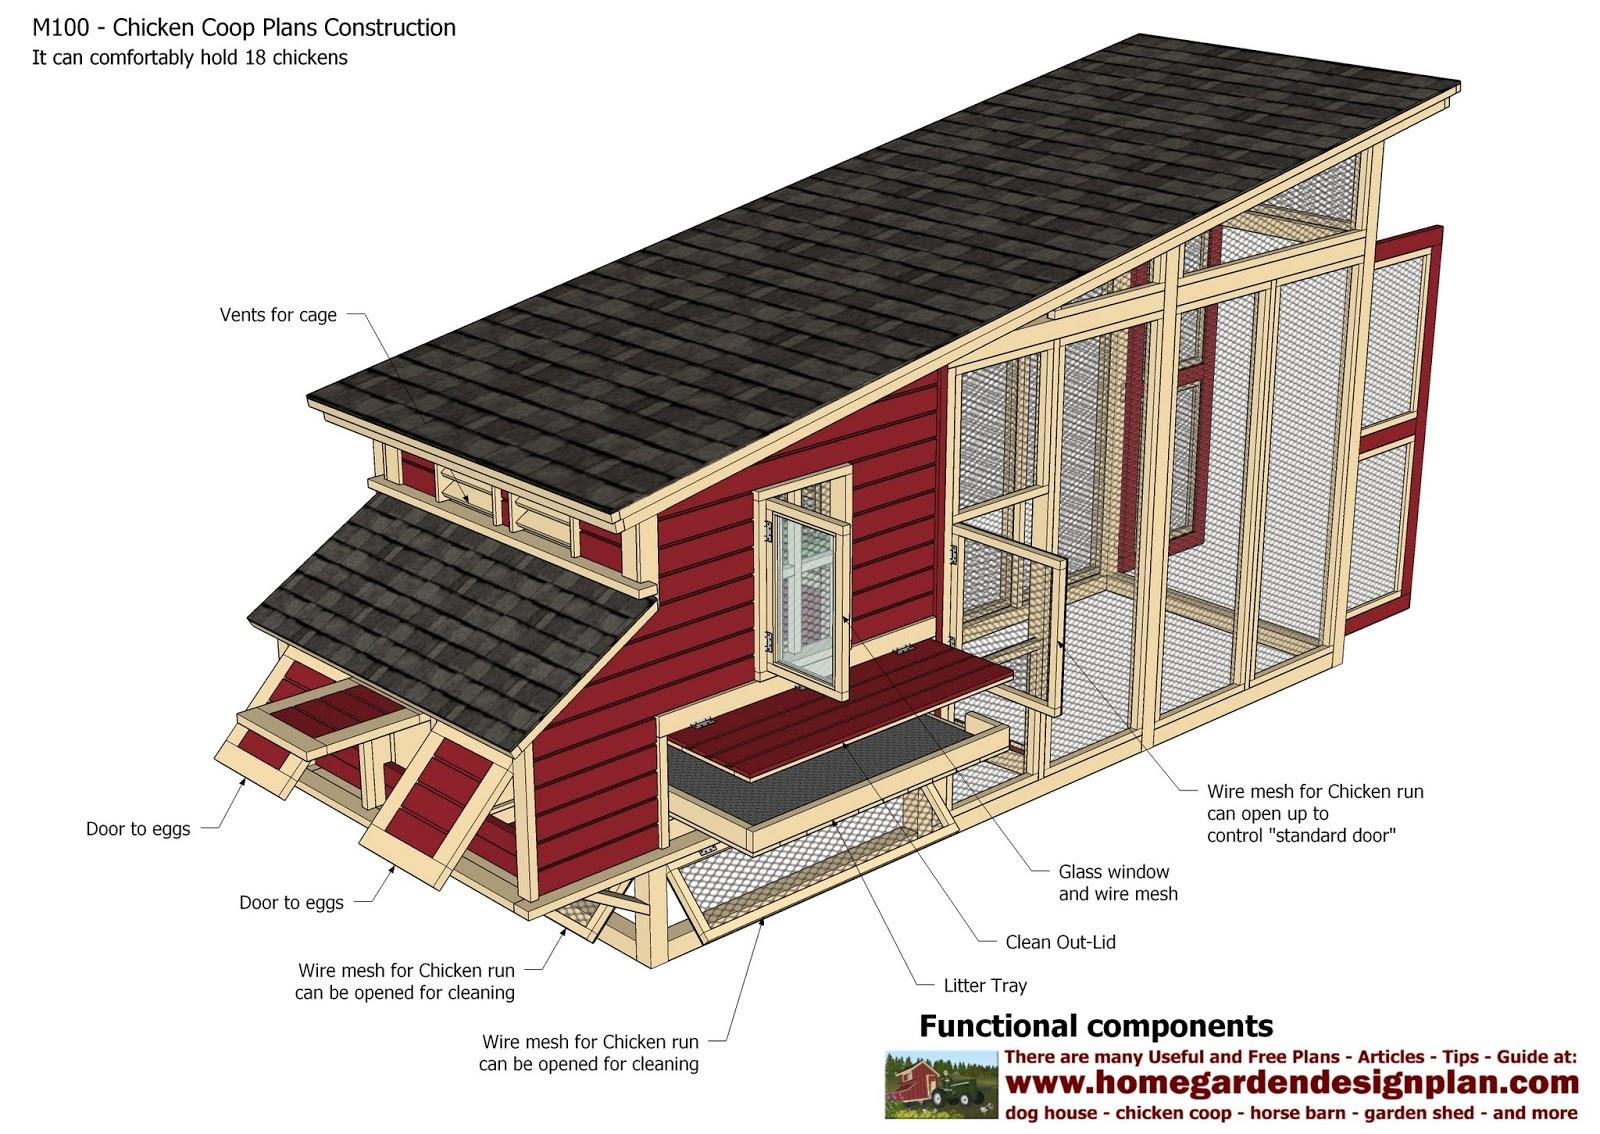 home garden plans: M100 - Chicken Coop Plans Construction ...